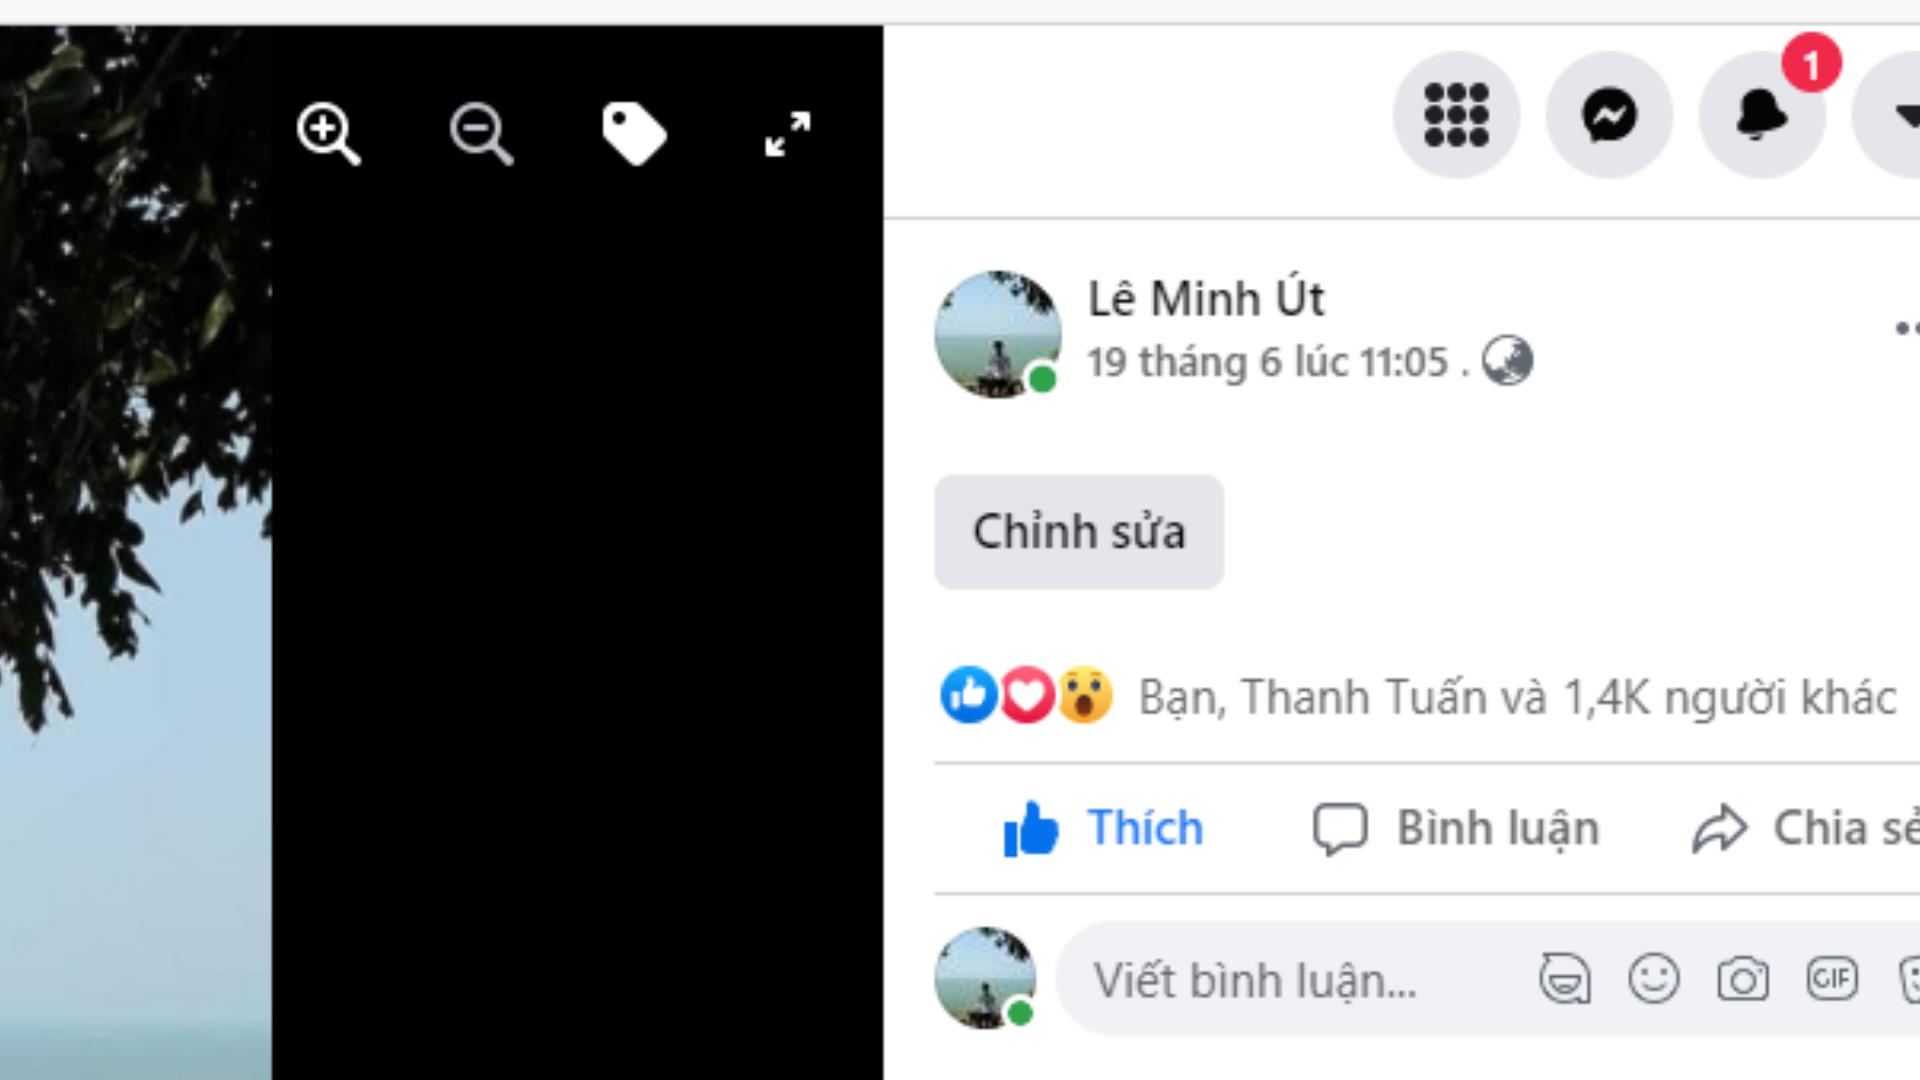 Tăng Like Facebook, Tương Tác Chéo, Trao Đổi Sub, Tăng Like Chéo, Sub Miễn Phí